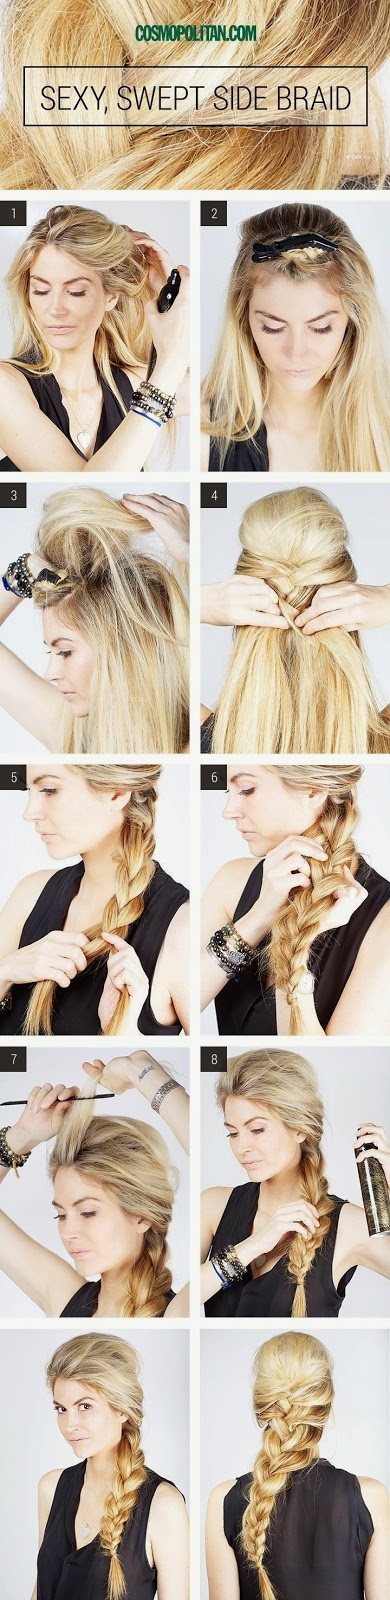 Cara Mengepang Rambut